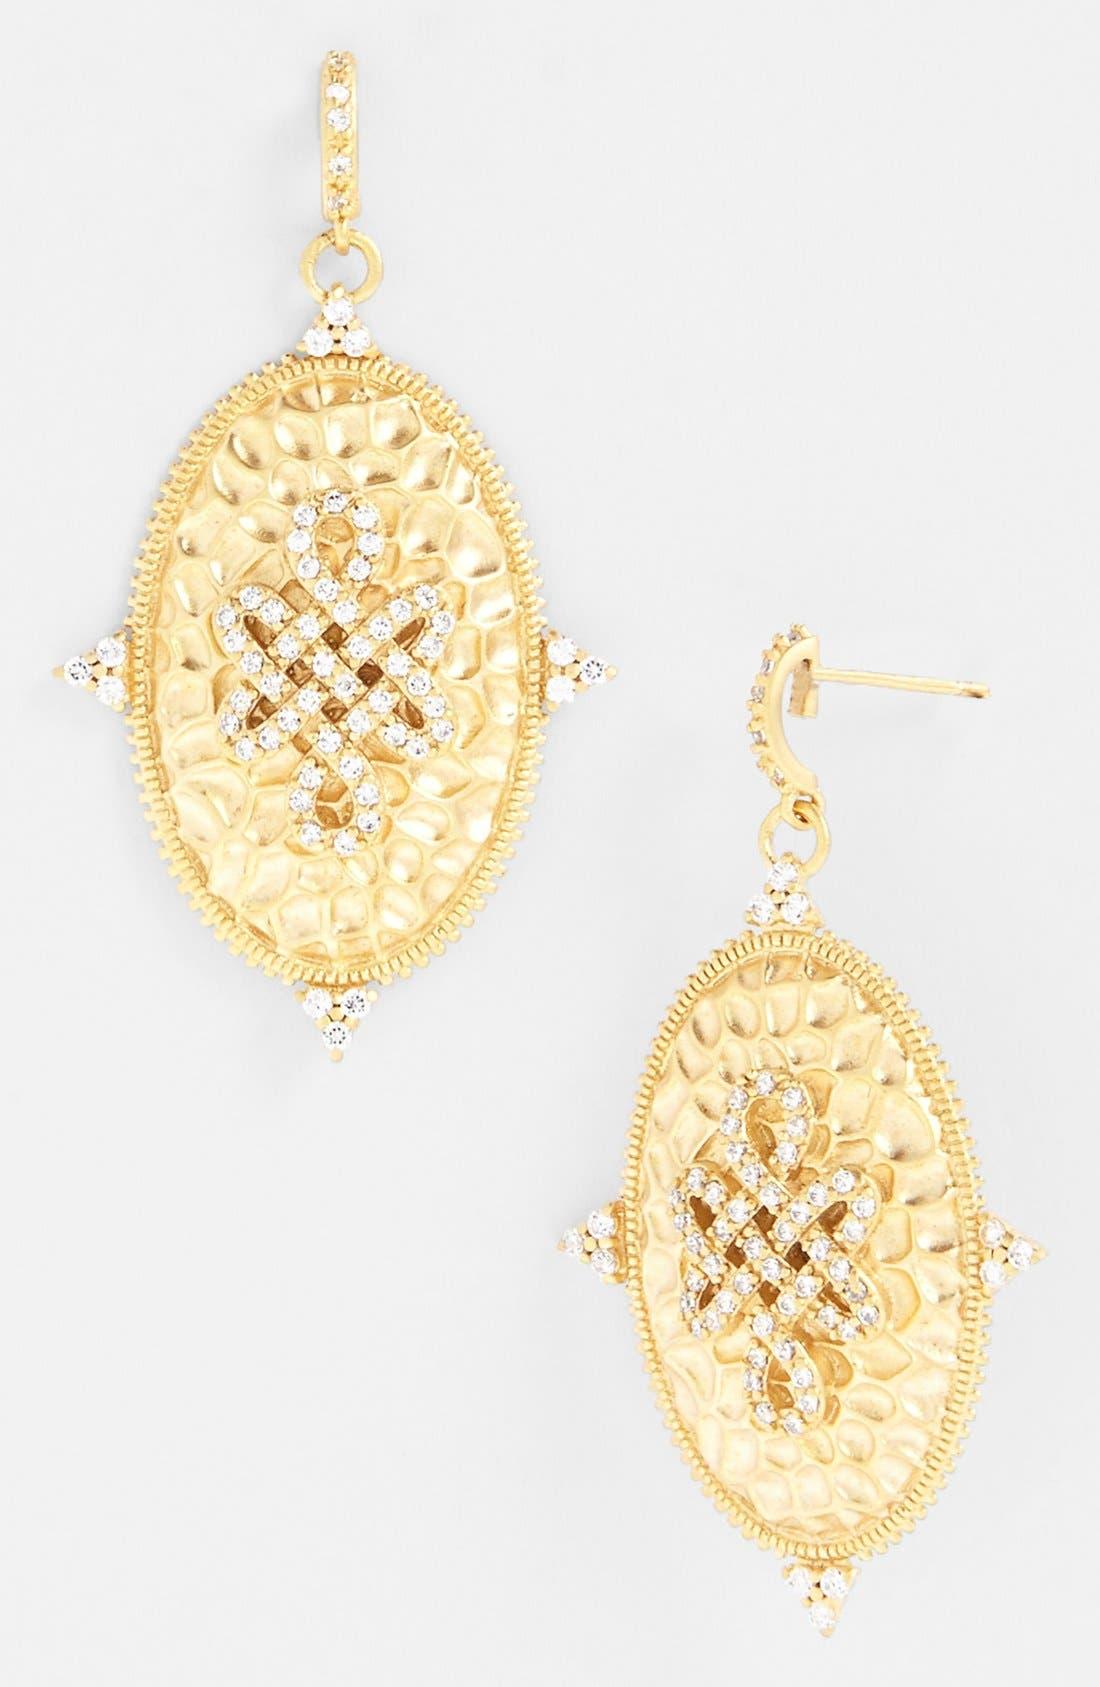 Alternate Image 1 Selected - FREIDA ROTHMAN 'Gramercy' Love Knot Oval Shield Earrings